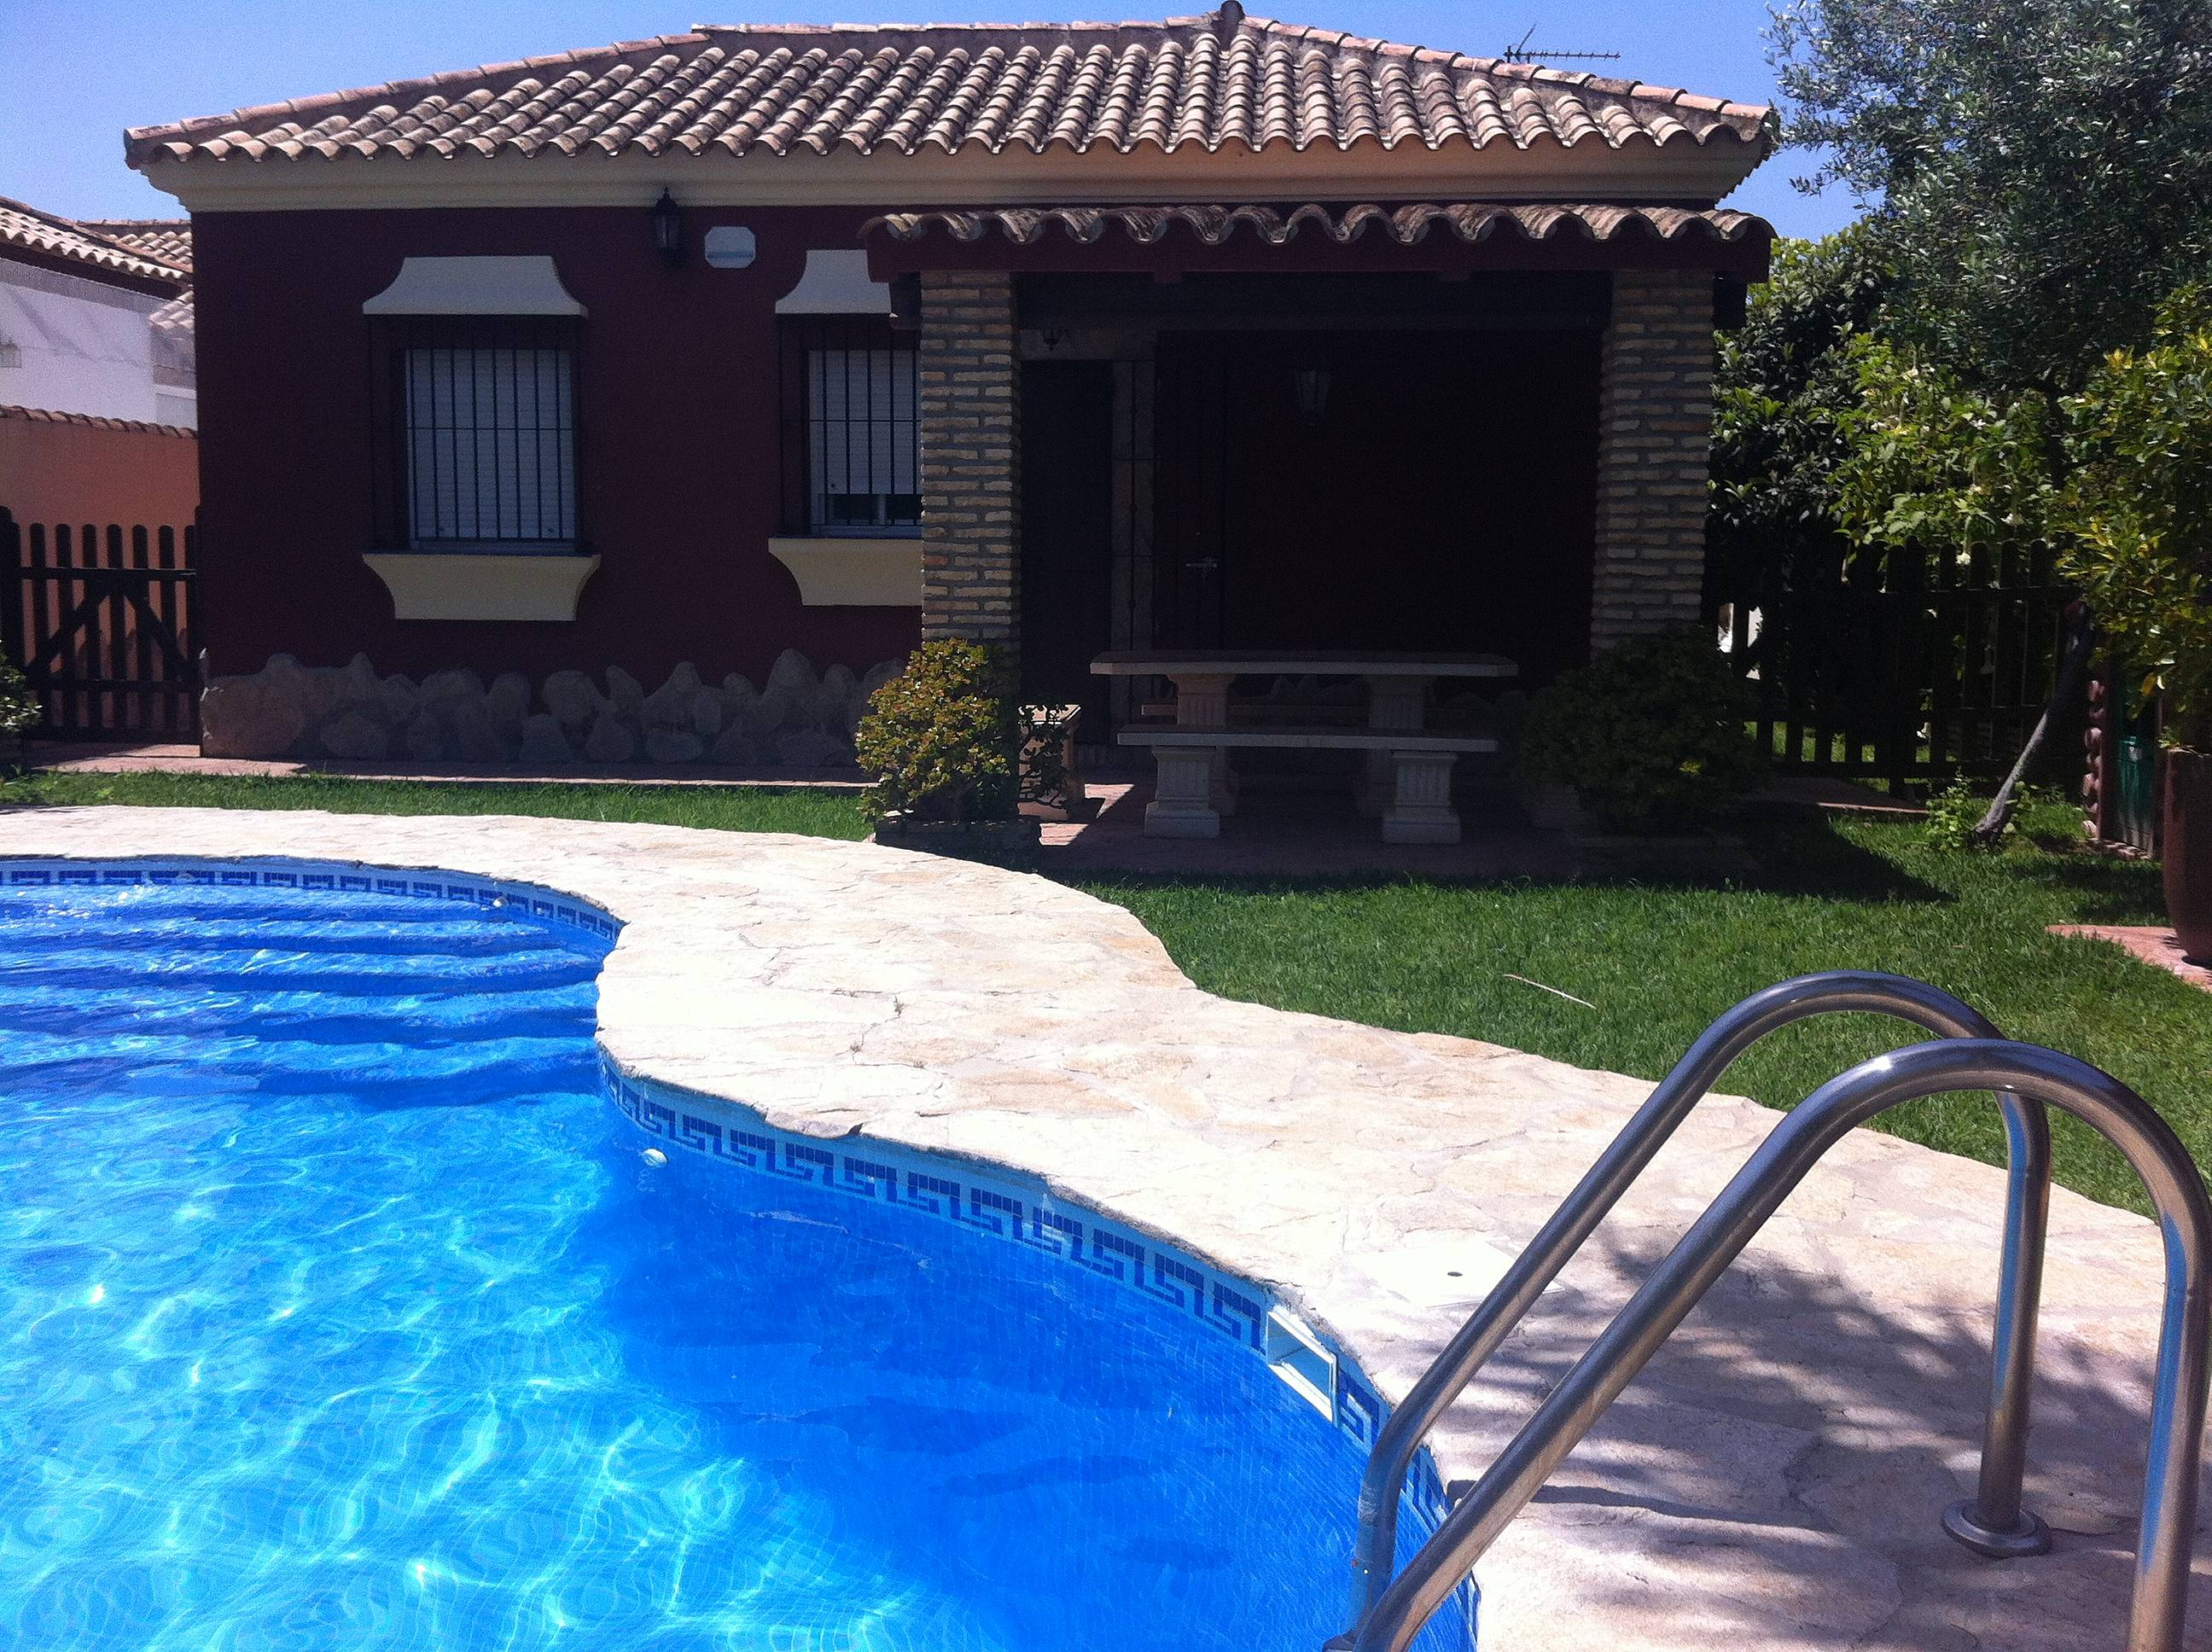 Chalet piscina privada chiclana playa la barrosa la for Piscinas chiclana